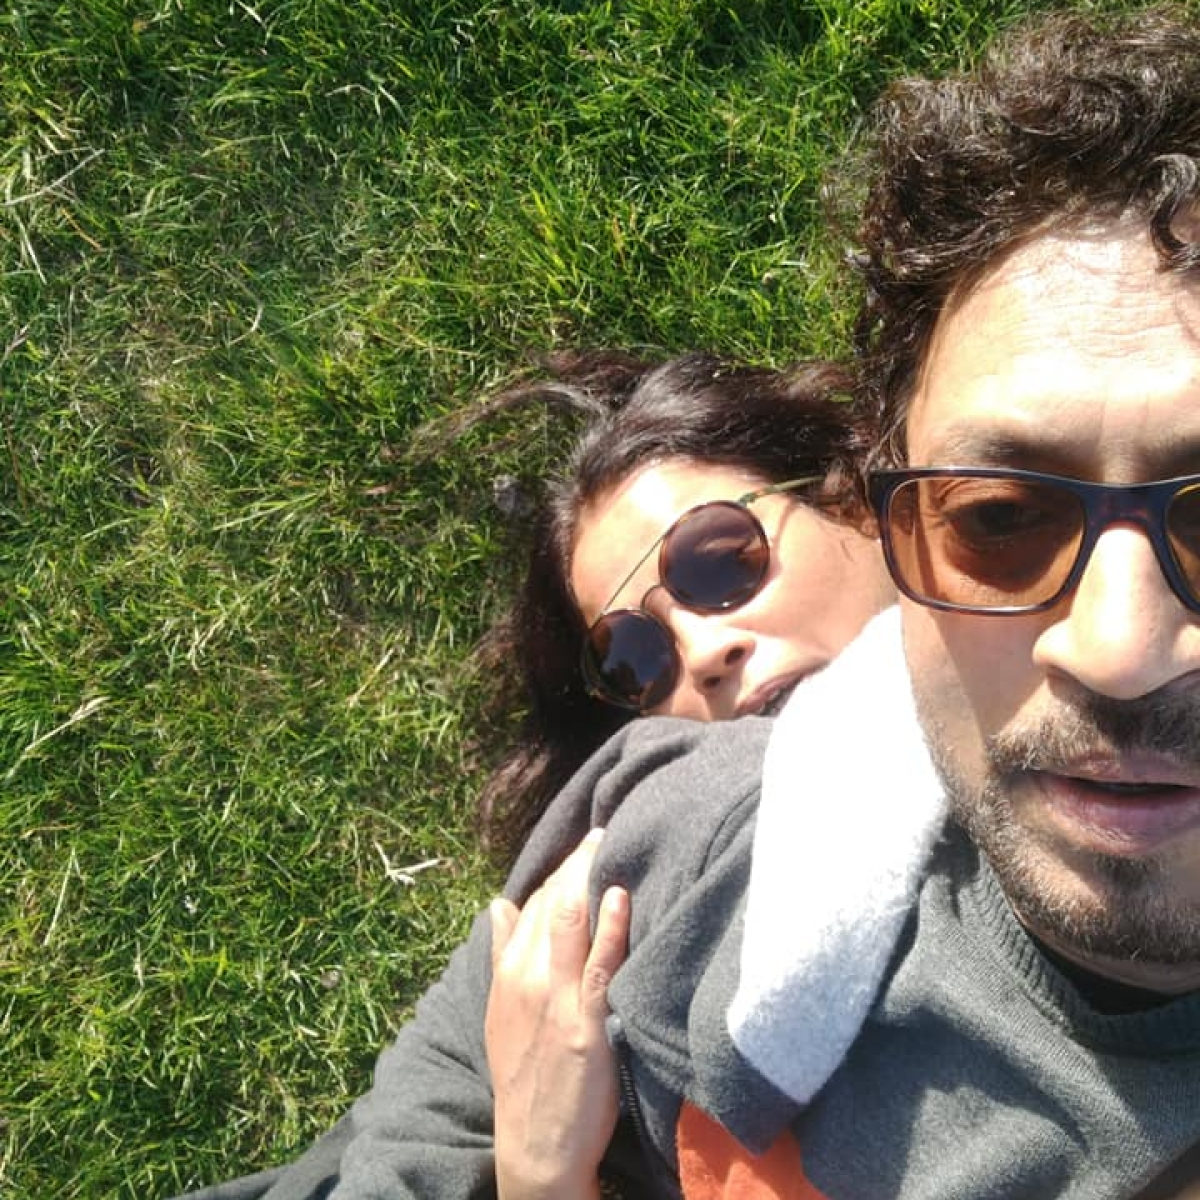 'Till we meet again': Sutapa Sikdar pays tribute to husband Irrfan Khan, pens emotional message